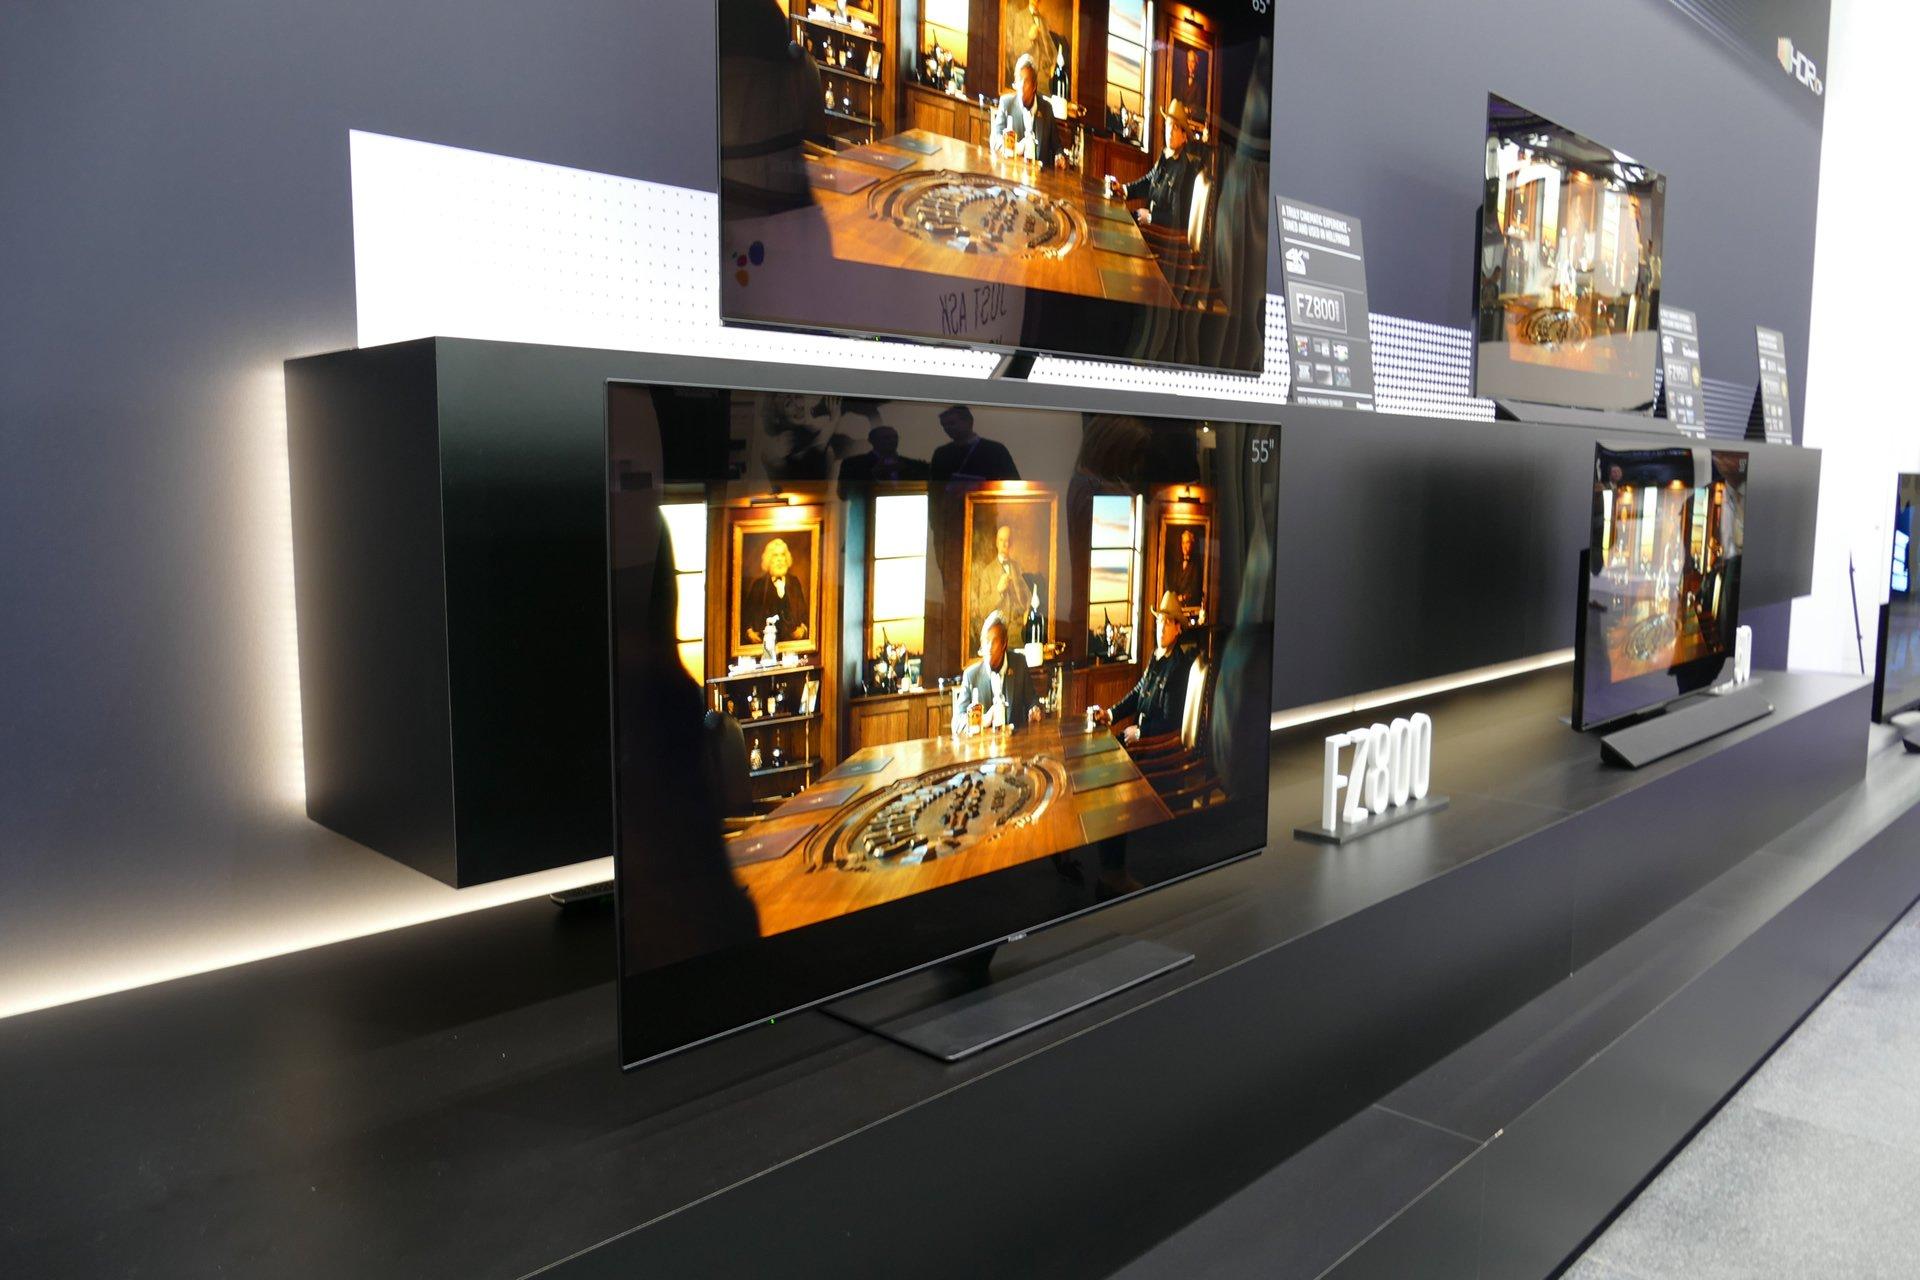 Panasonic 2018 TV Priser og lanceringstidspunkt